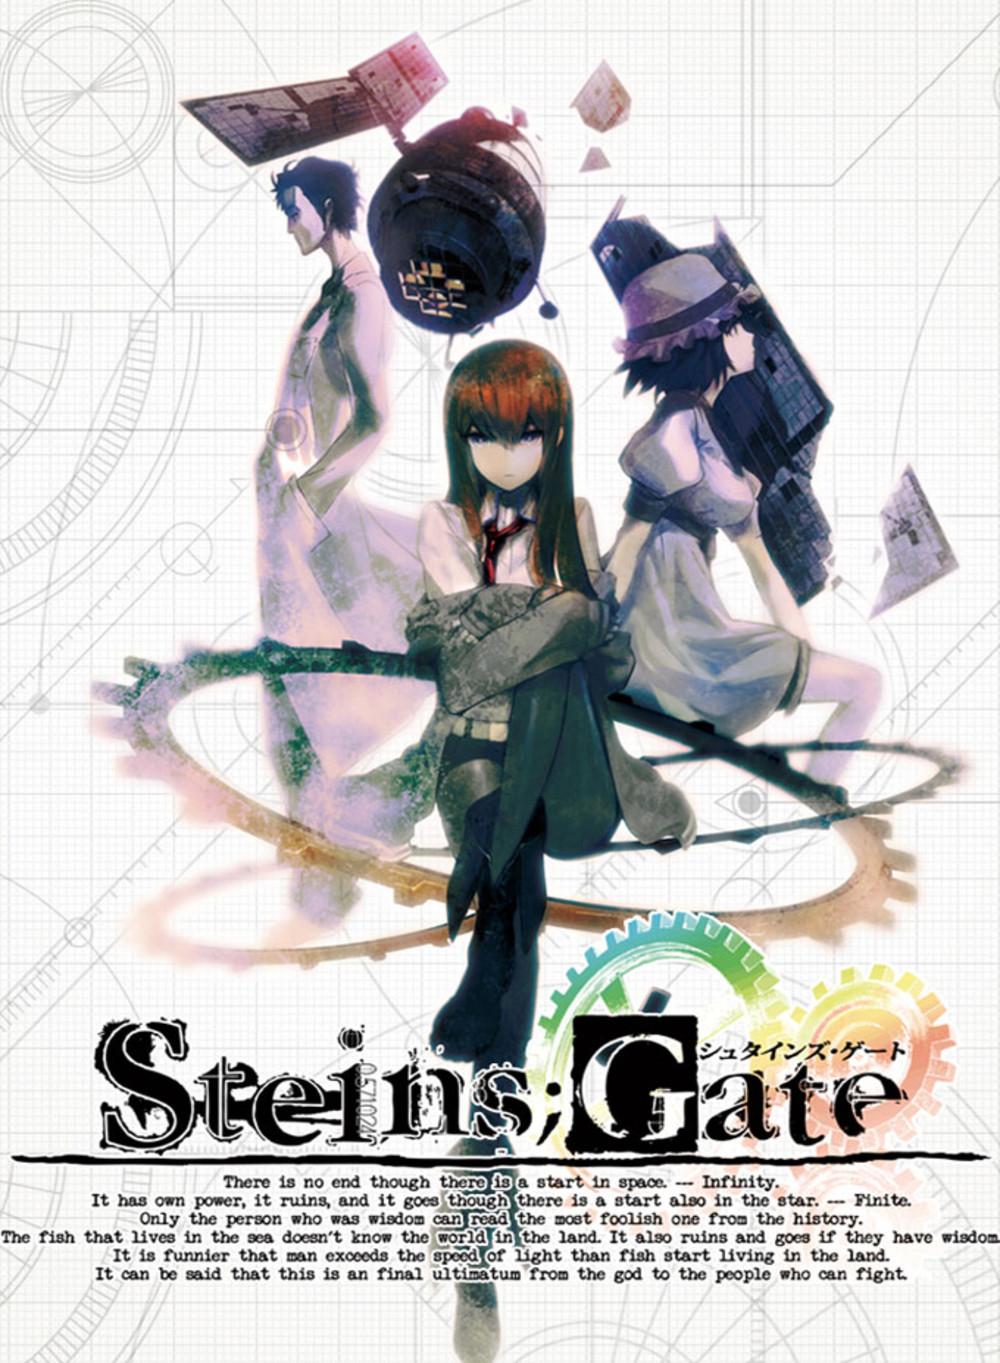 Anime Steins;Gate za darmo - Sezon 1 @ Microsoft Store